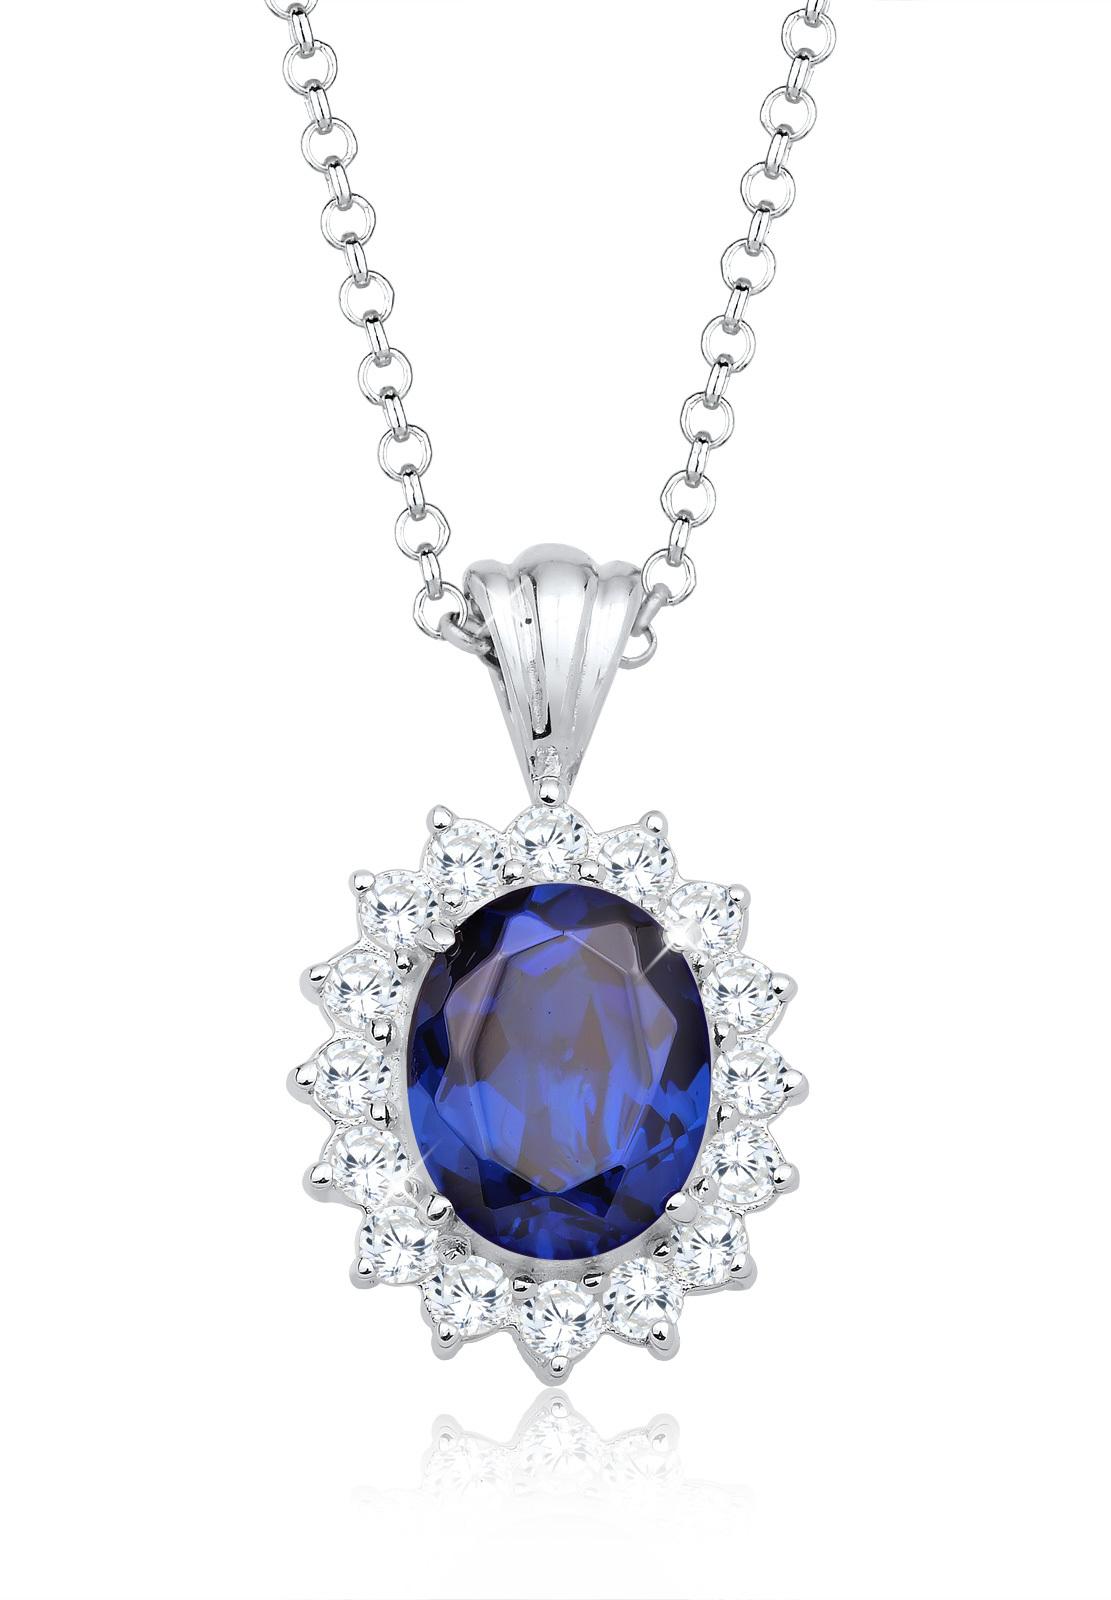 Halskette | Saphir ( Blau ) | 925er Sterling Silber